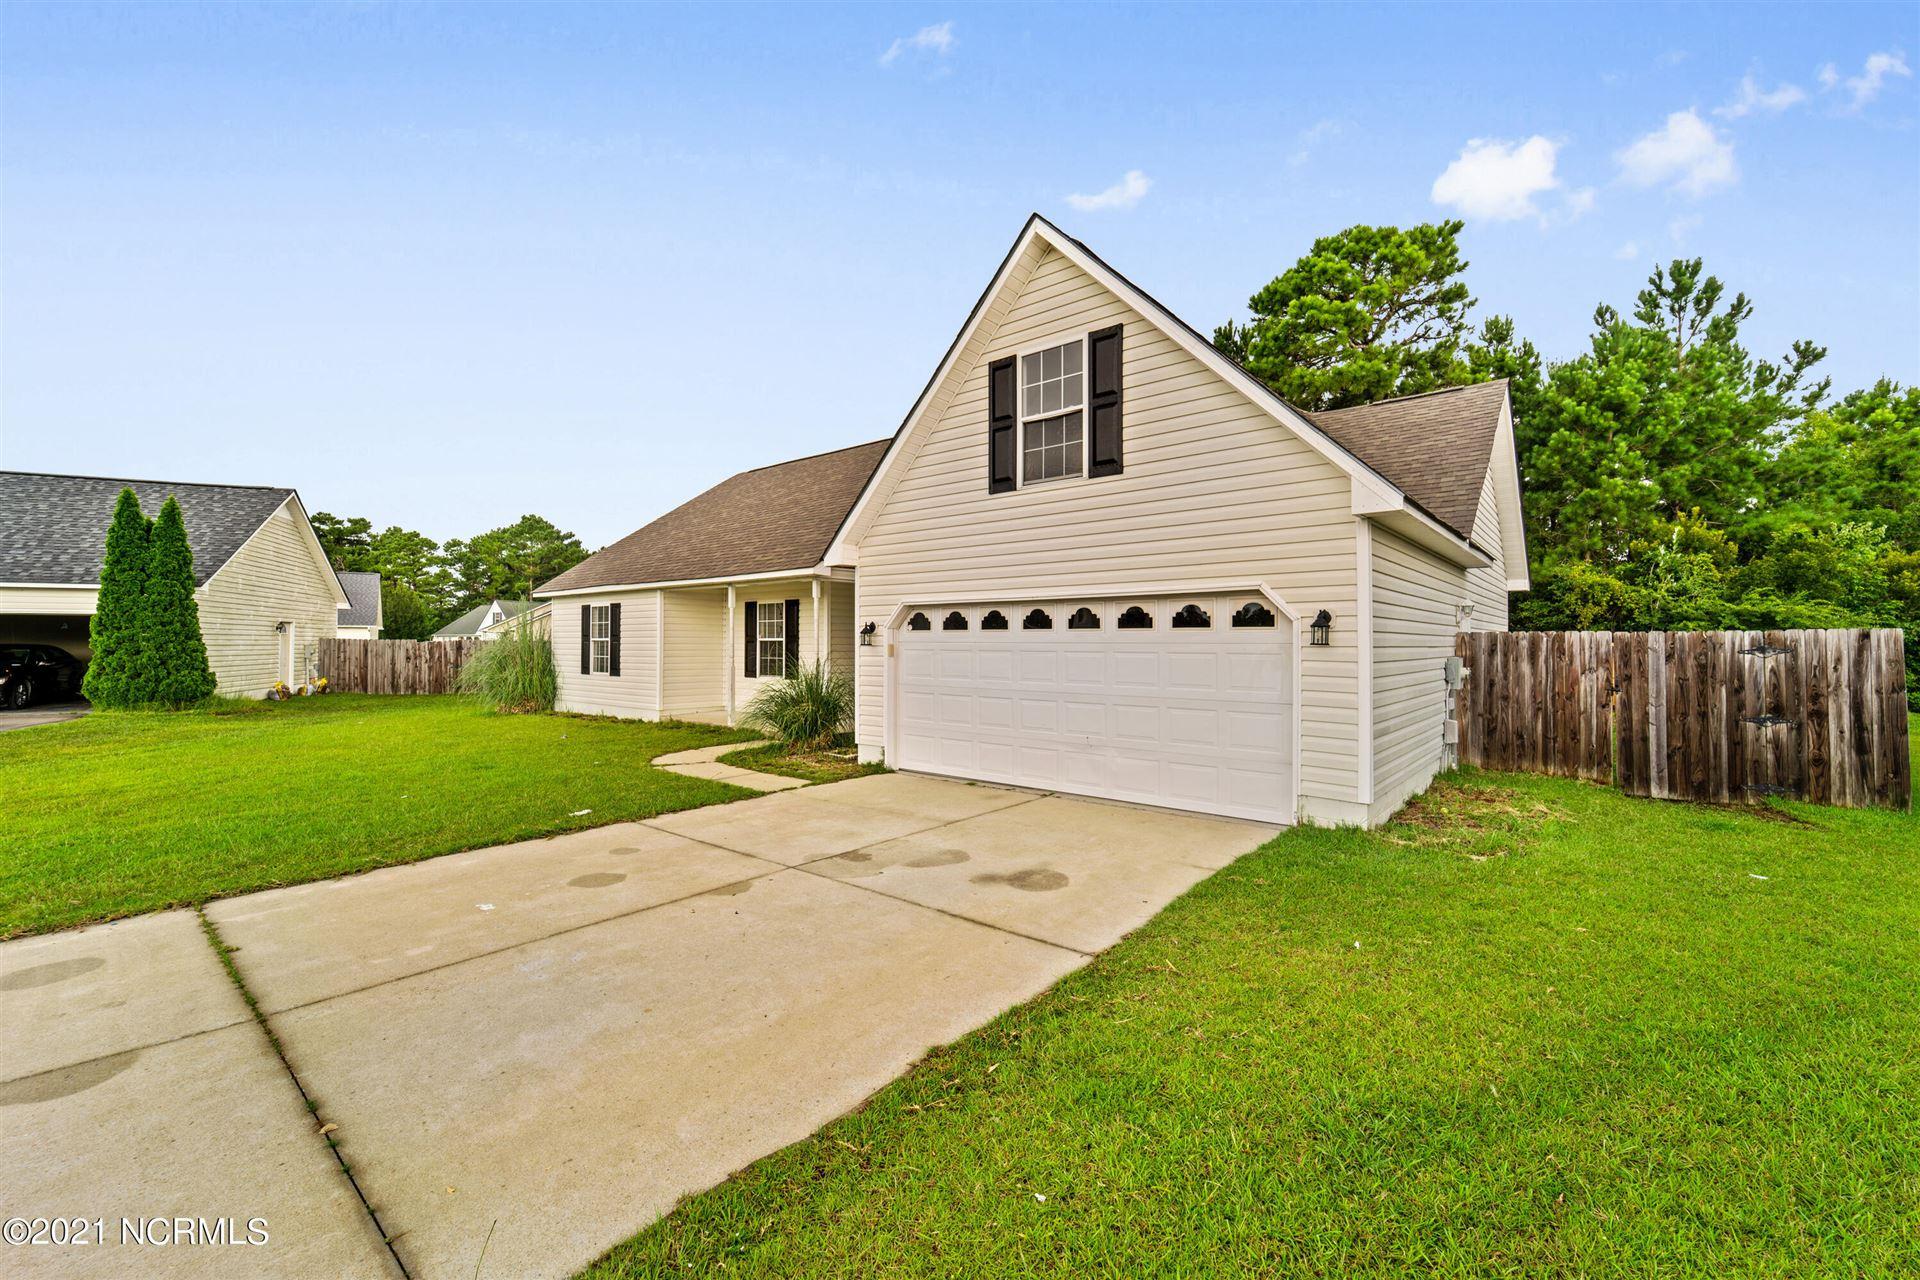 Photo of 719 Ironwood Drive, Havelock, NC 28532 (MLS # 100285213)